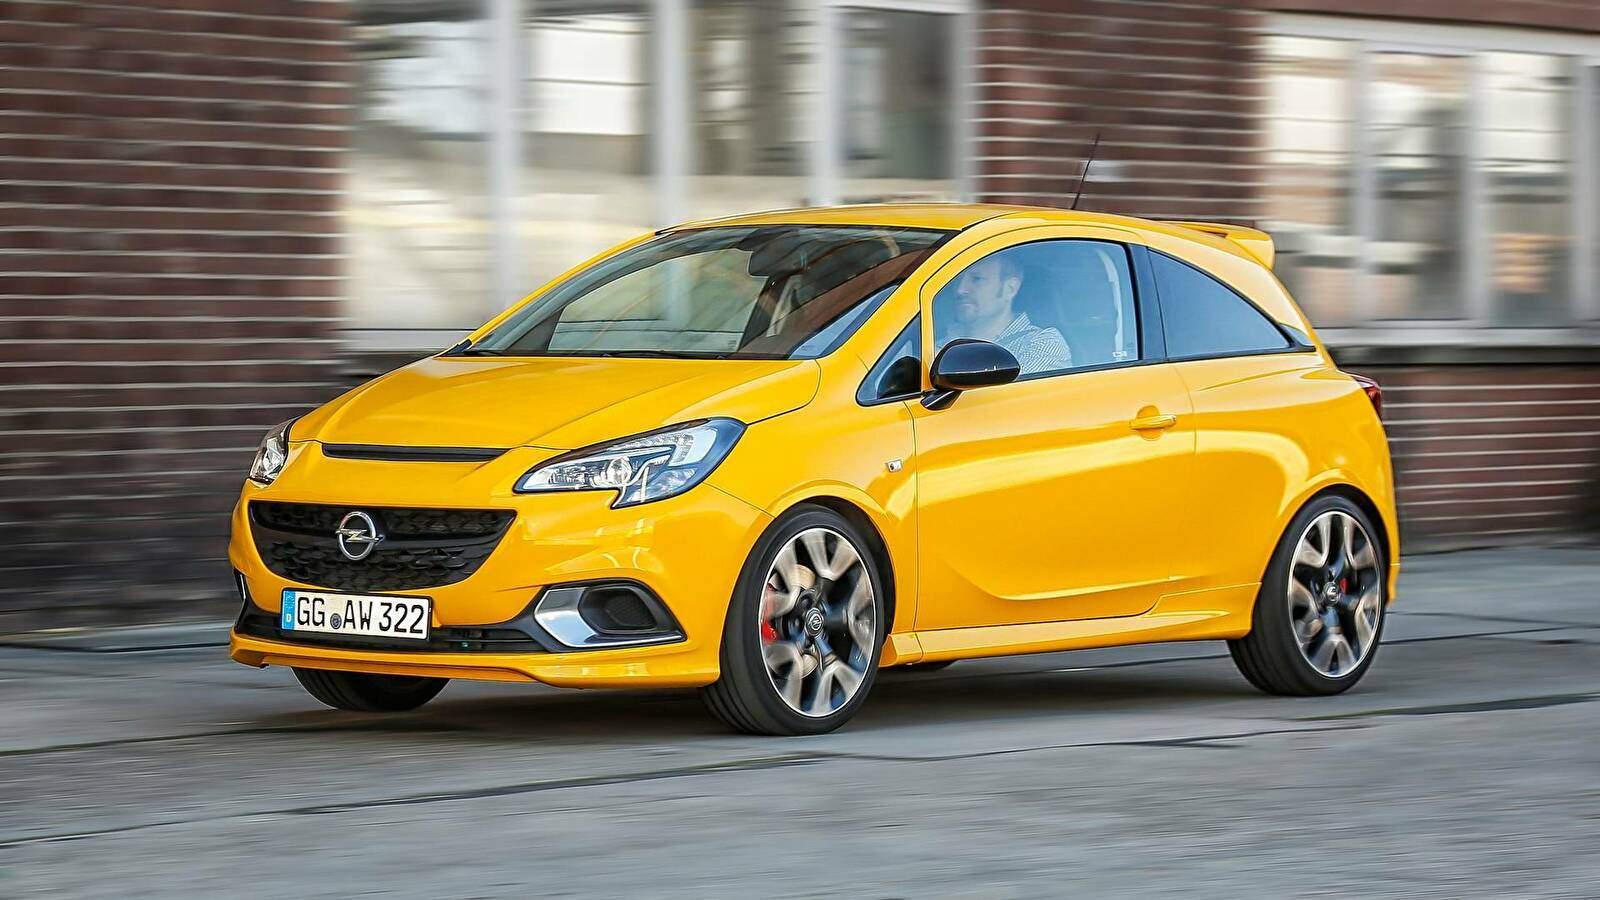 Opel Corsa V 1.4 Turbo 150 « GSi » (2018),  ajouté par fox58